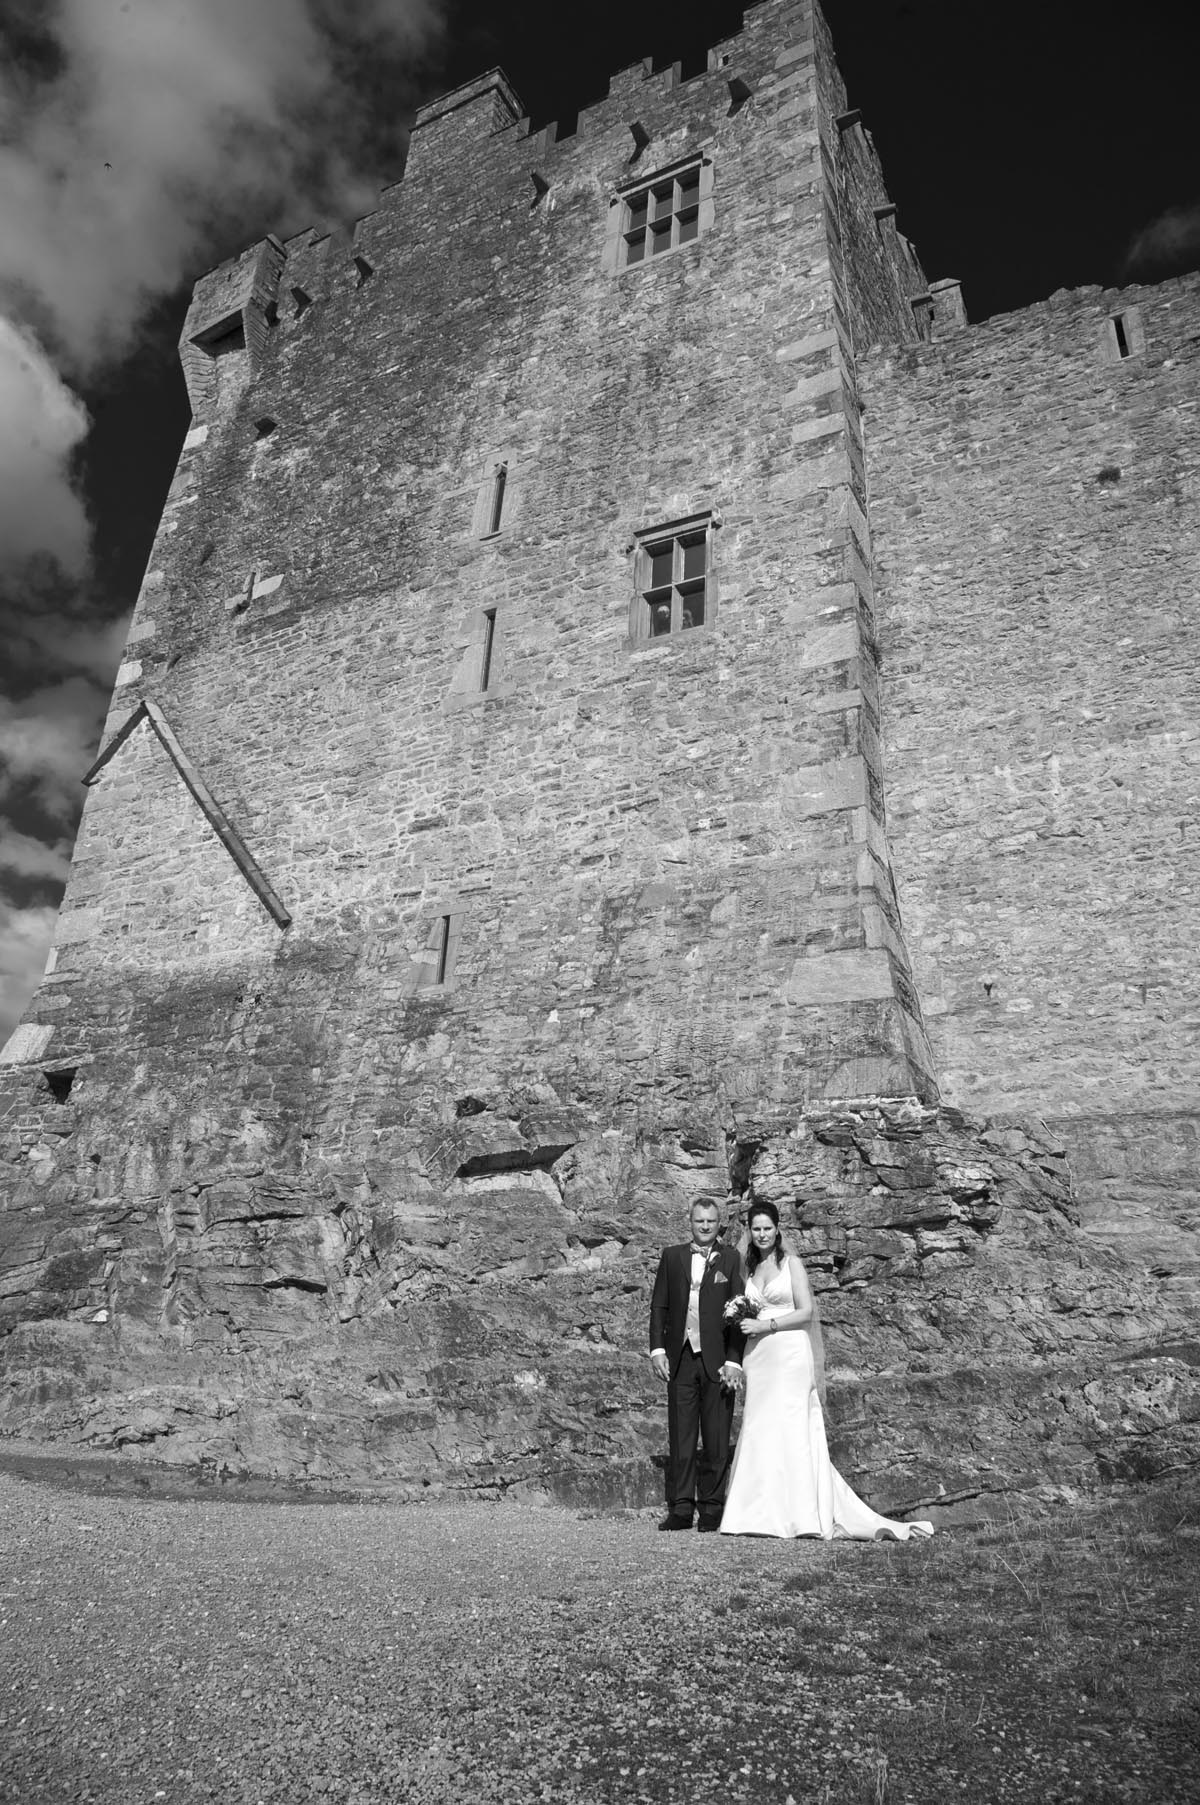 wedding in Ireland, Killarney National Park Ross Castle